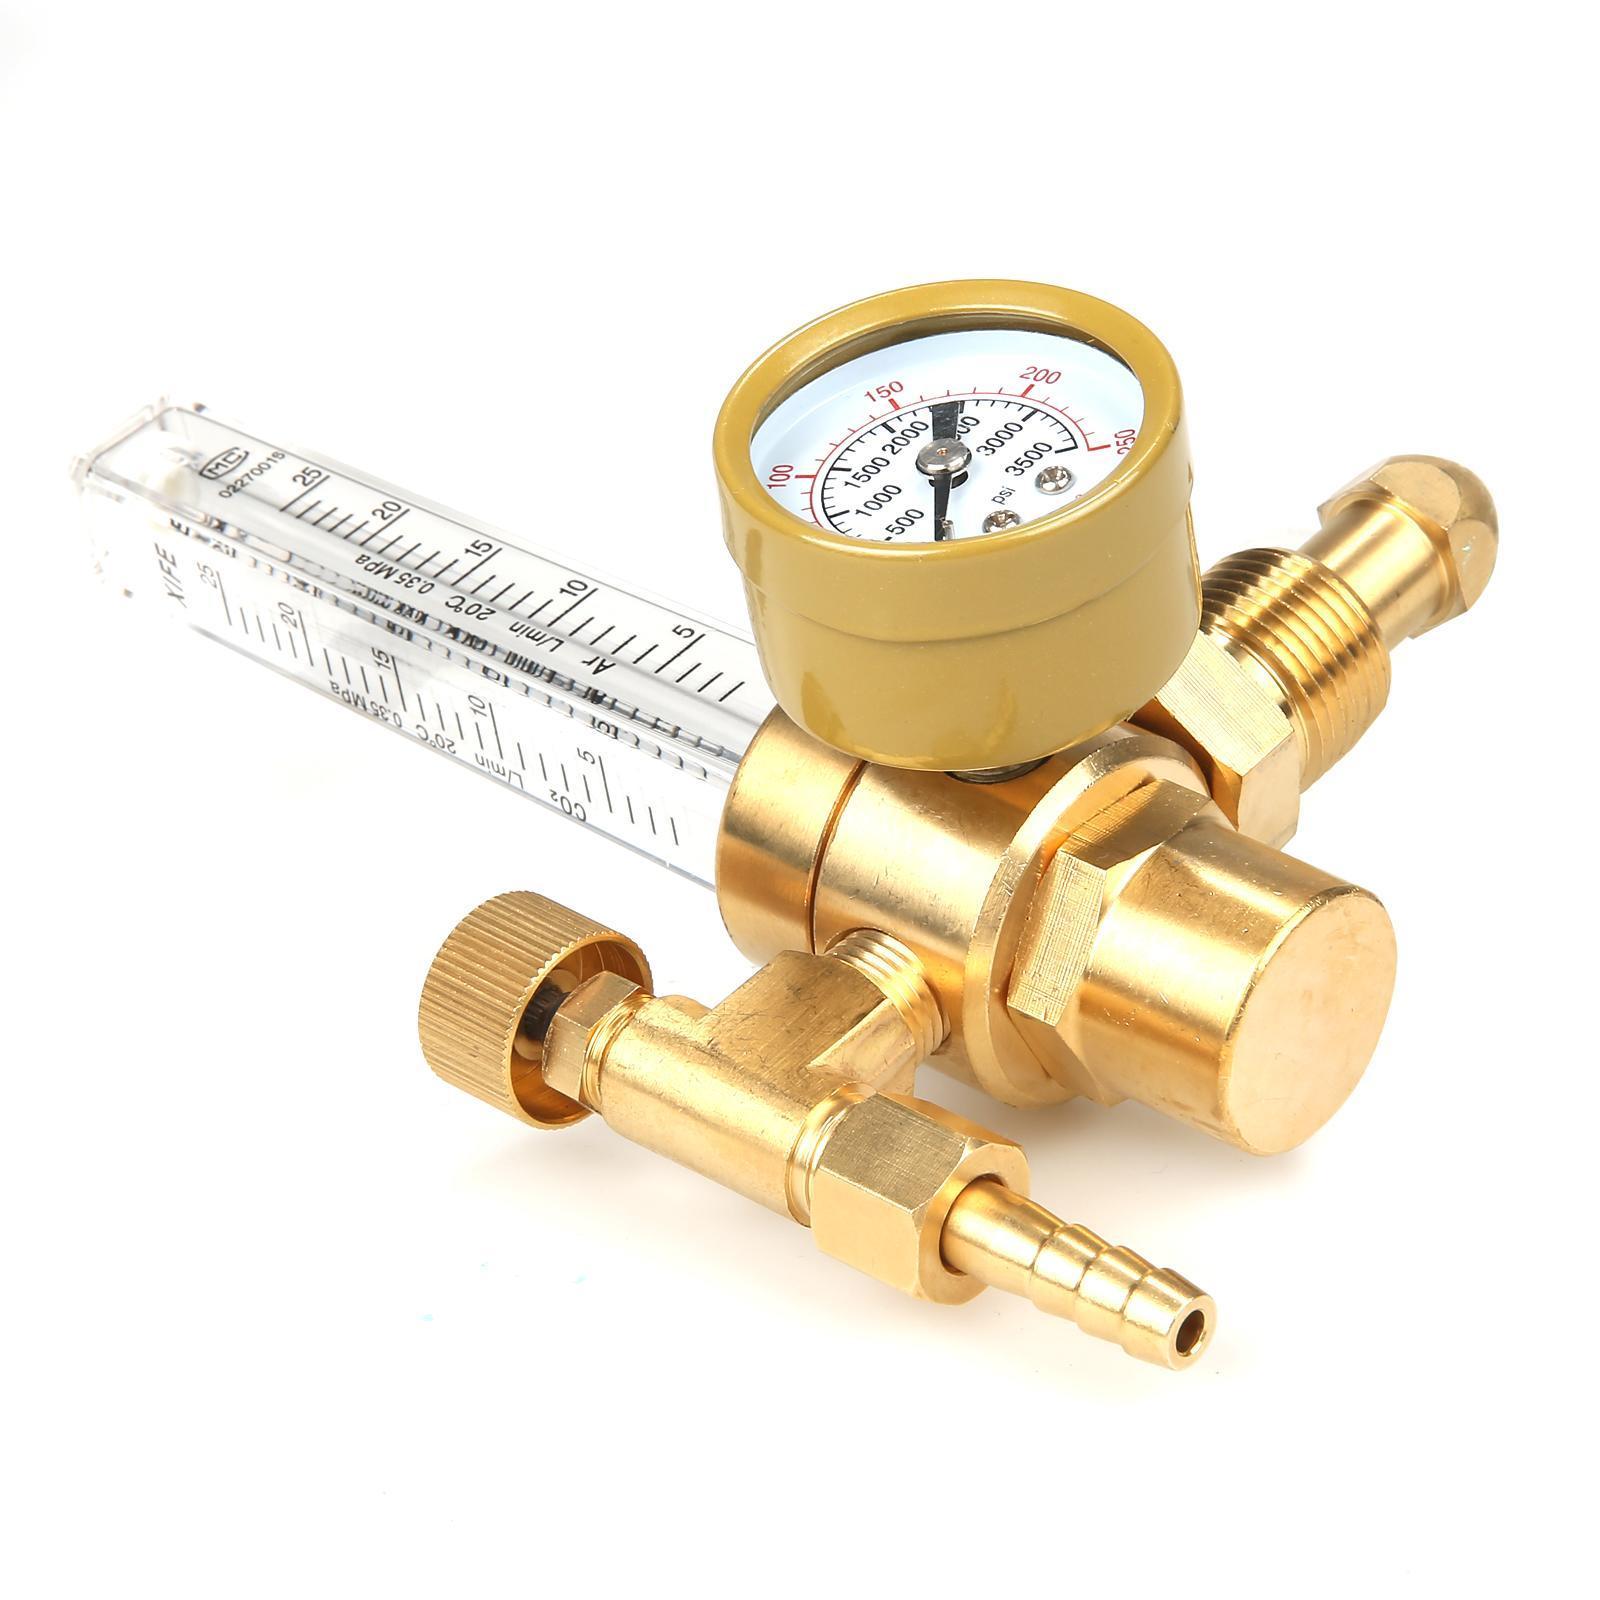 Universal Copper Argon CO2 Regulator Flowmeter Gas Pressure Gauge 3